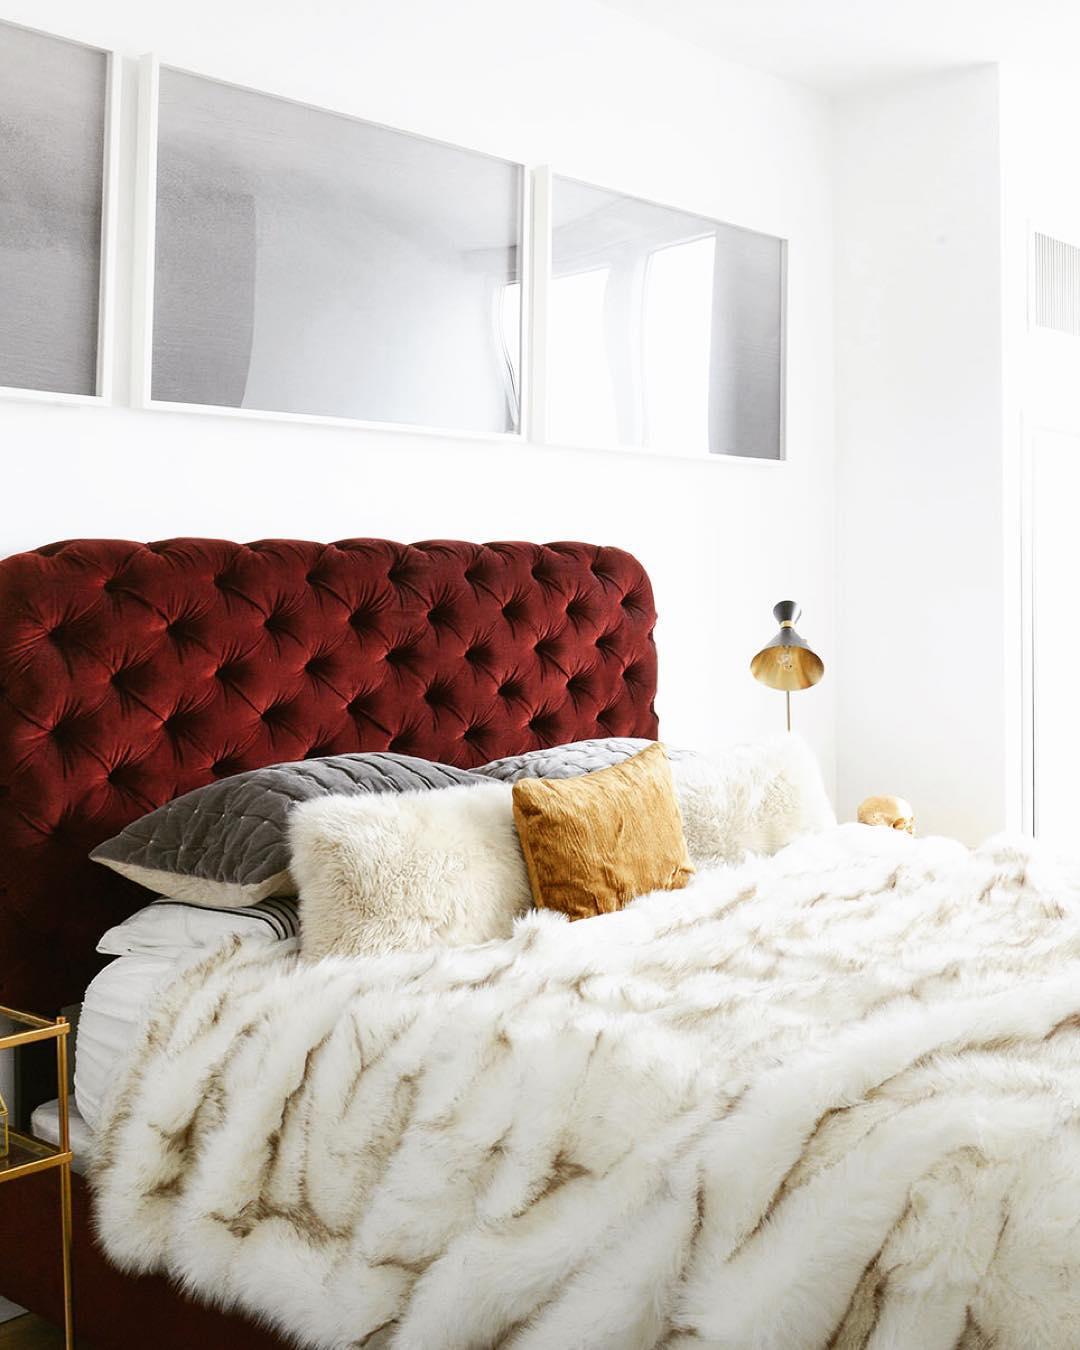 Dark Red Tufted Velvet Headboard with White Fur Throw